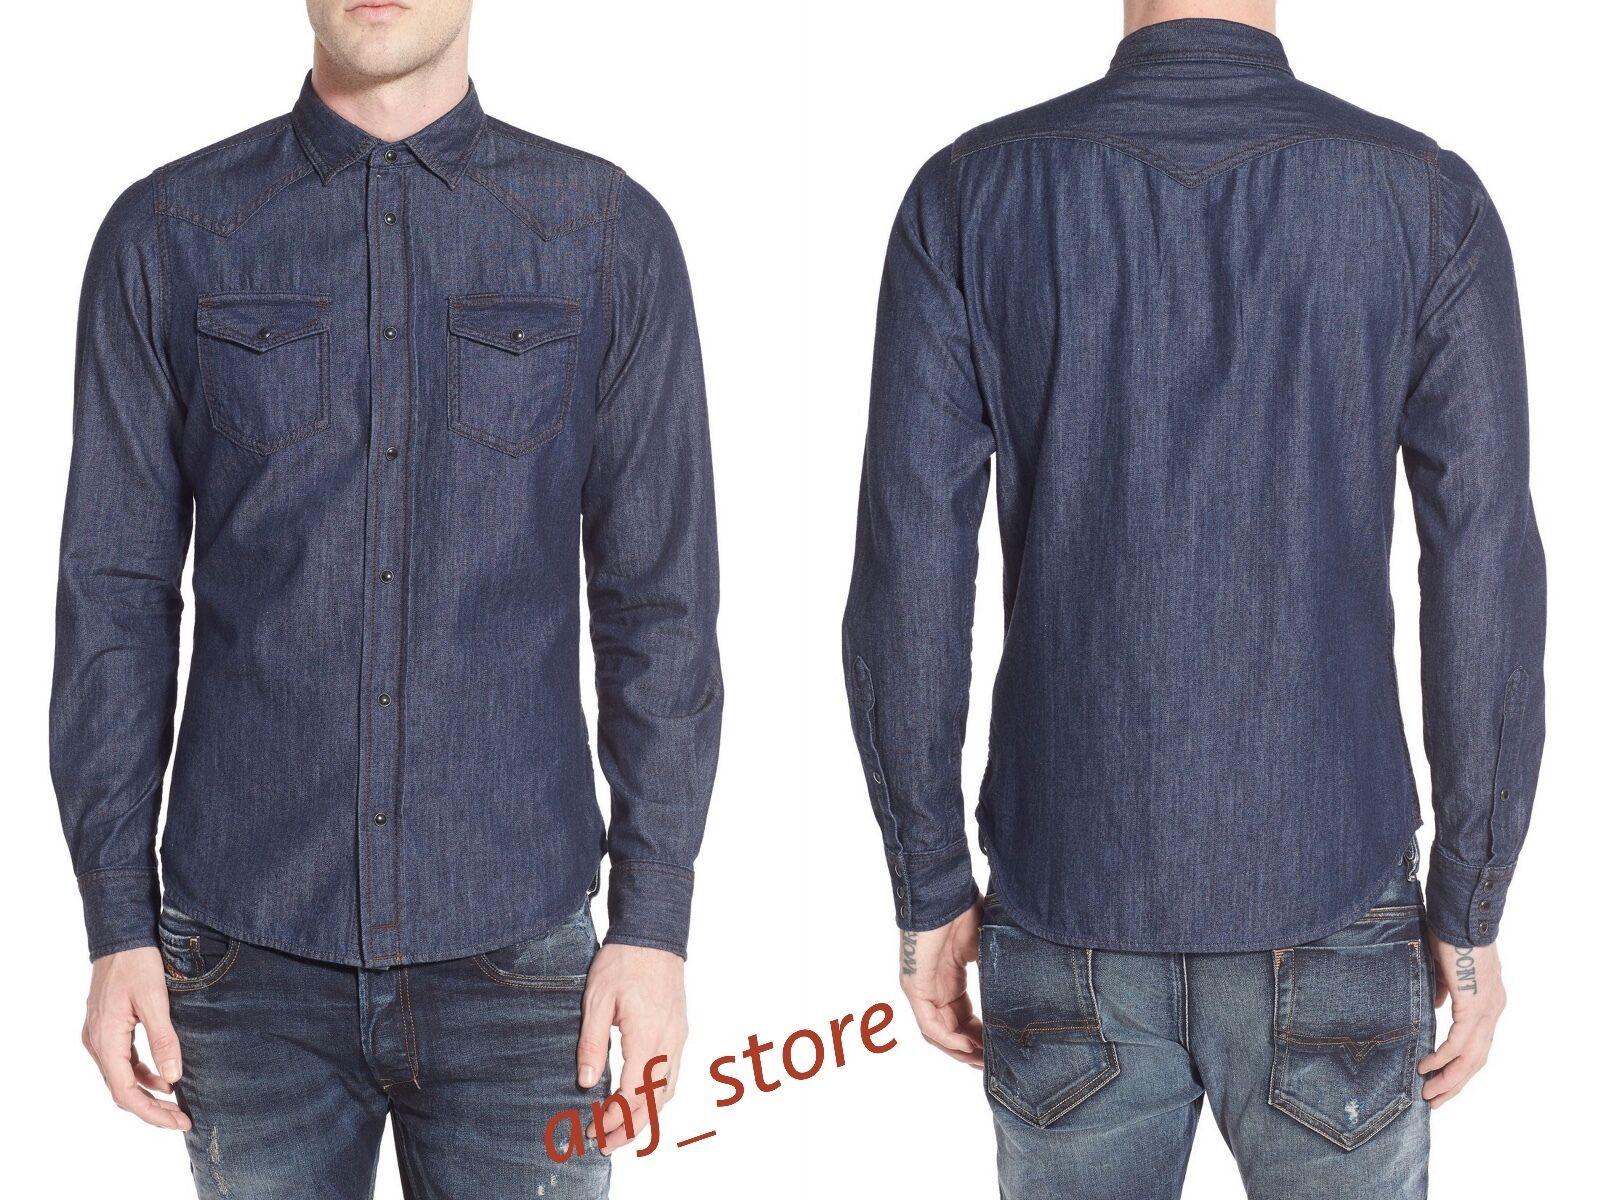 NWT DIESEL New Sonora Denim Jeans Western DARK Cotton Mens L S Shirt M L XL